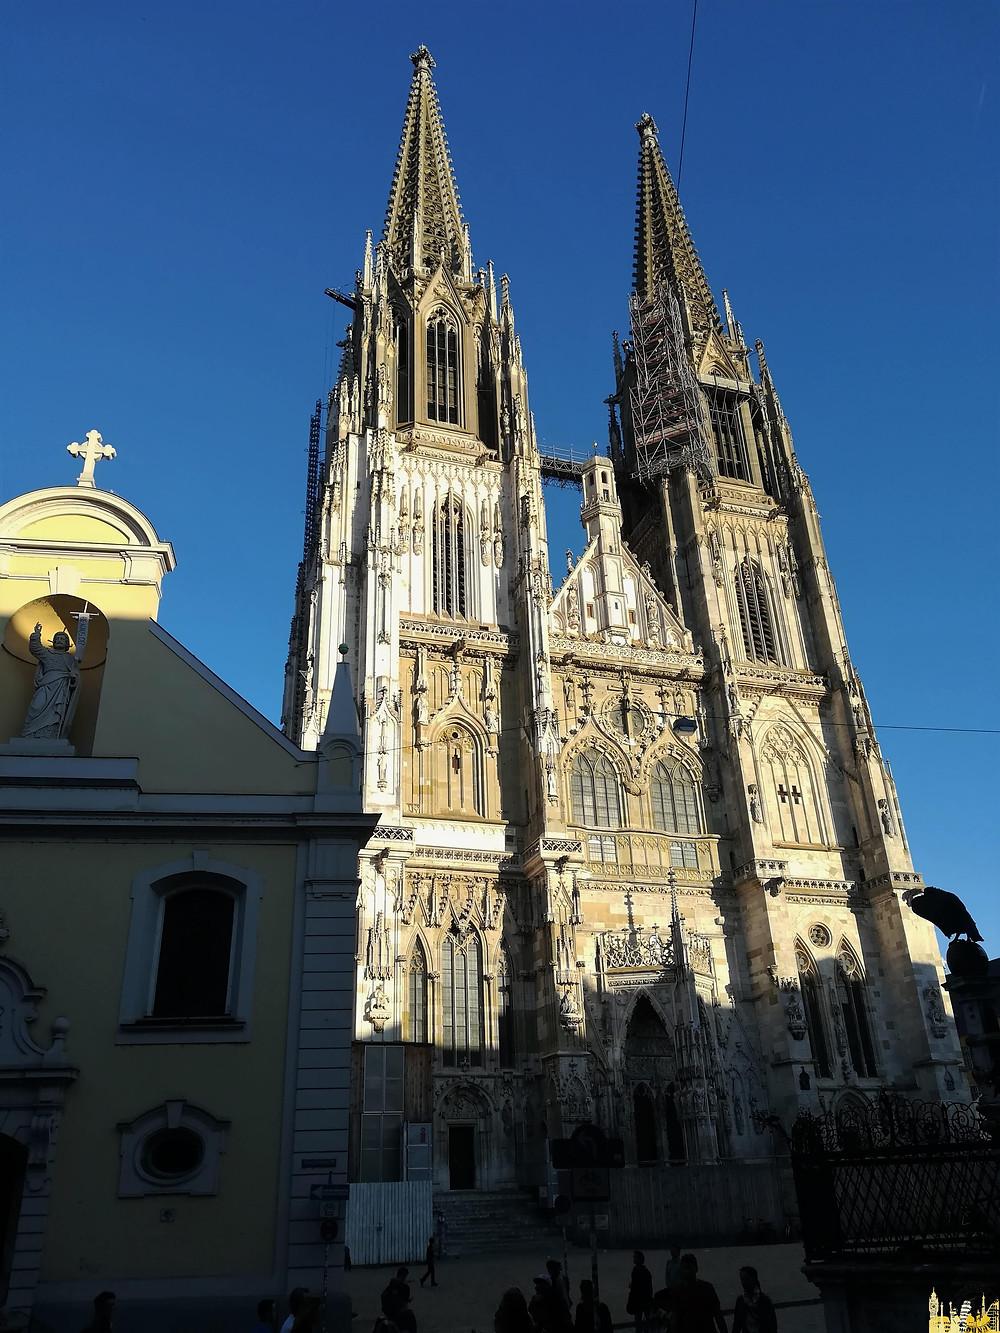 Ratisbona (Alemania). Catedral de San Pedro